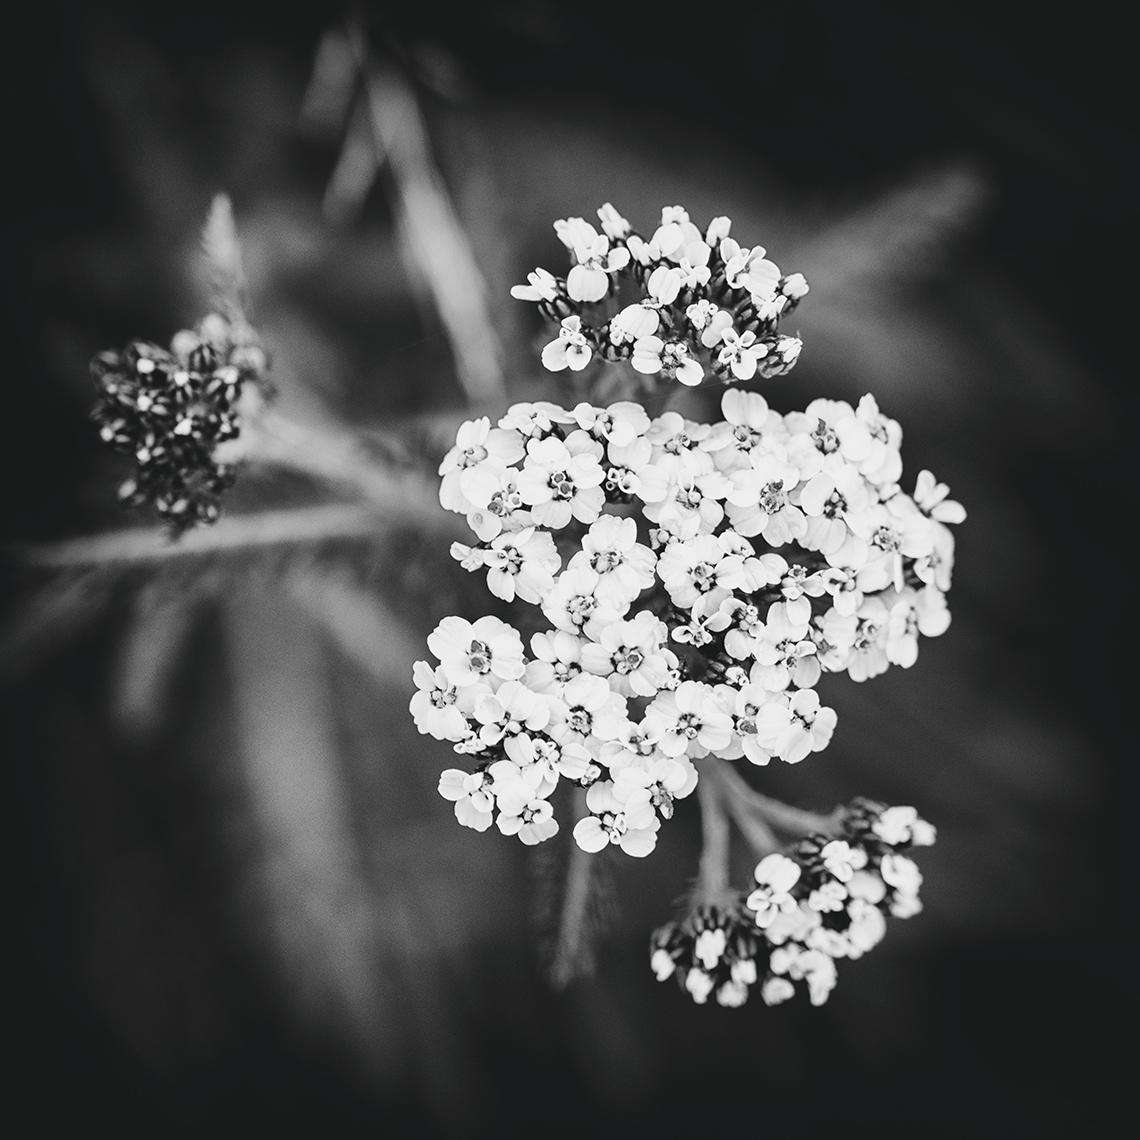 Landscape Photography of yarrow